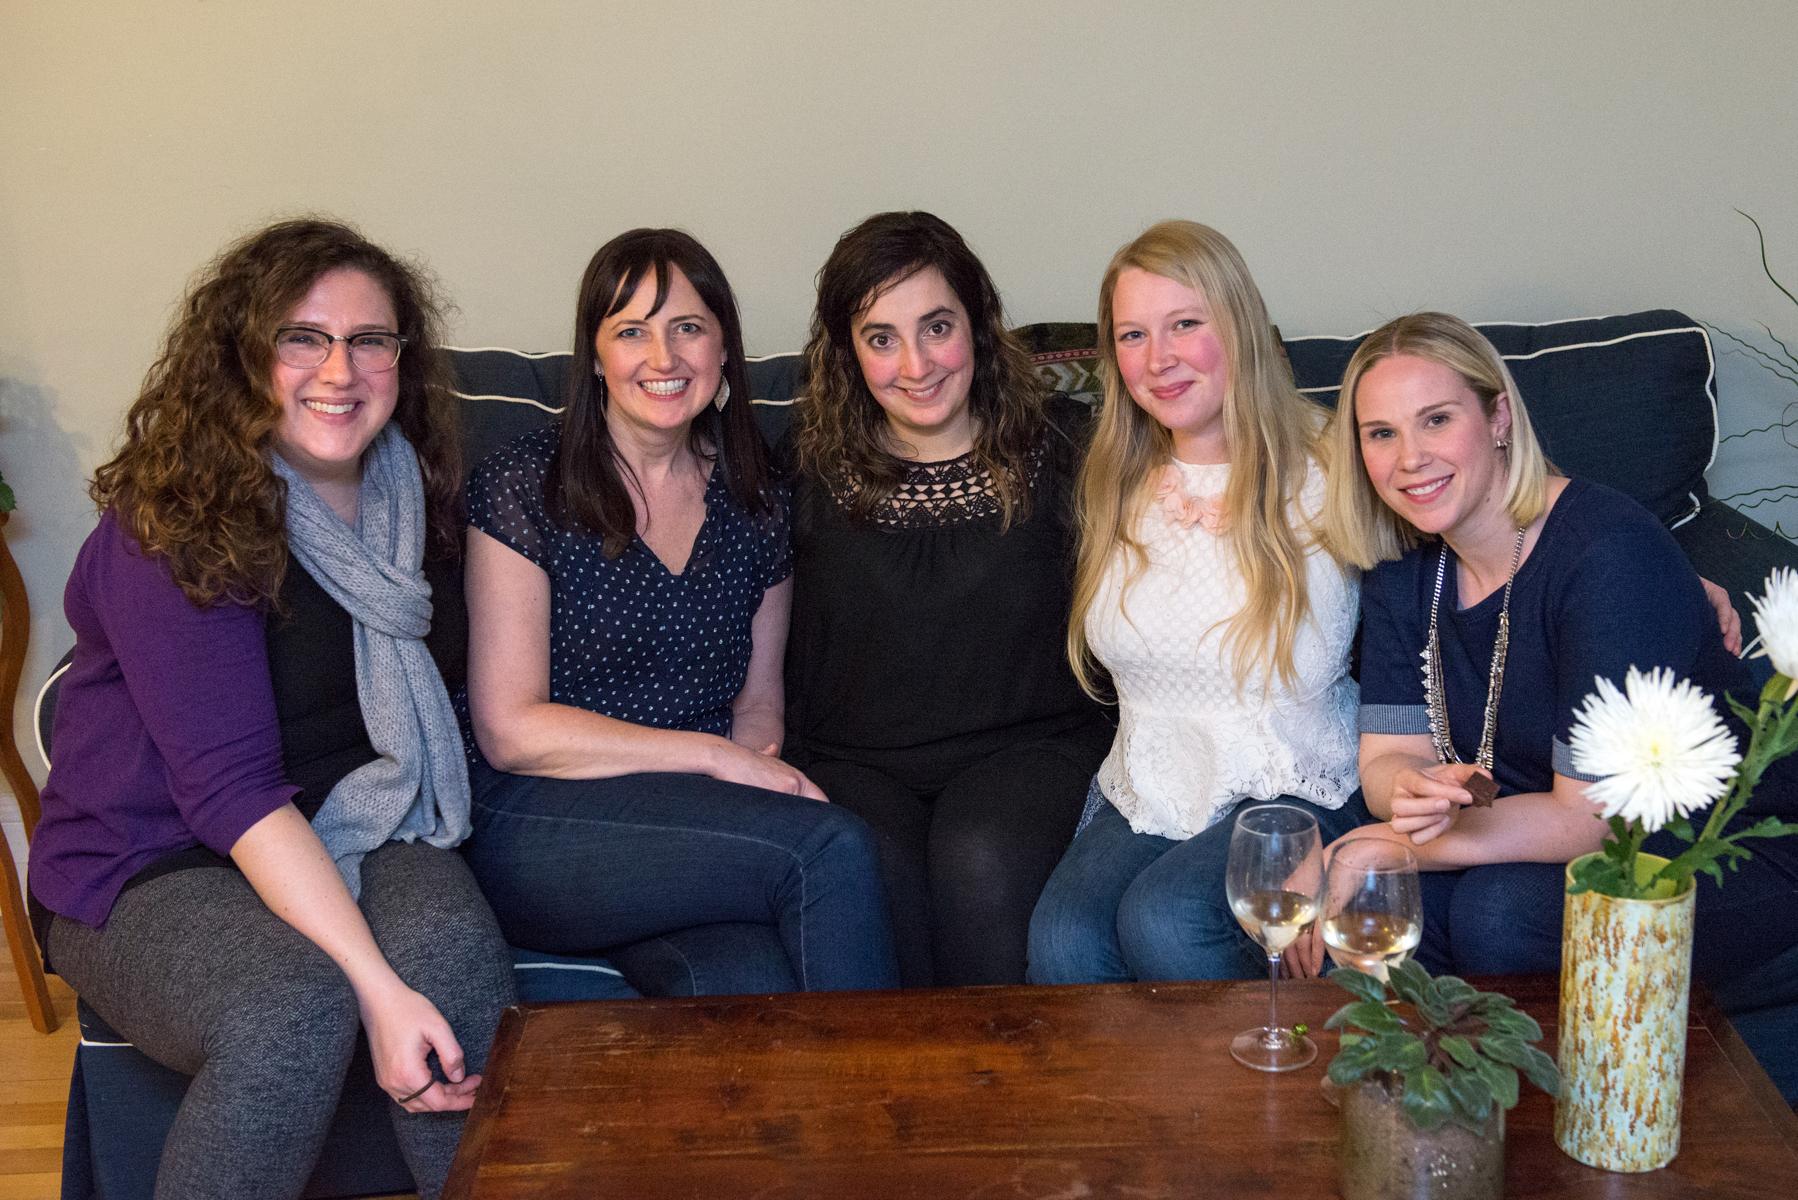 Beautiful ladies: Michelle, Heidi, Moi, Sarah & Celine!